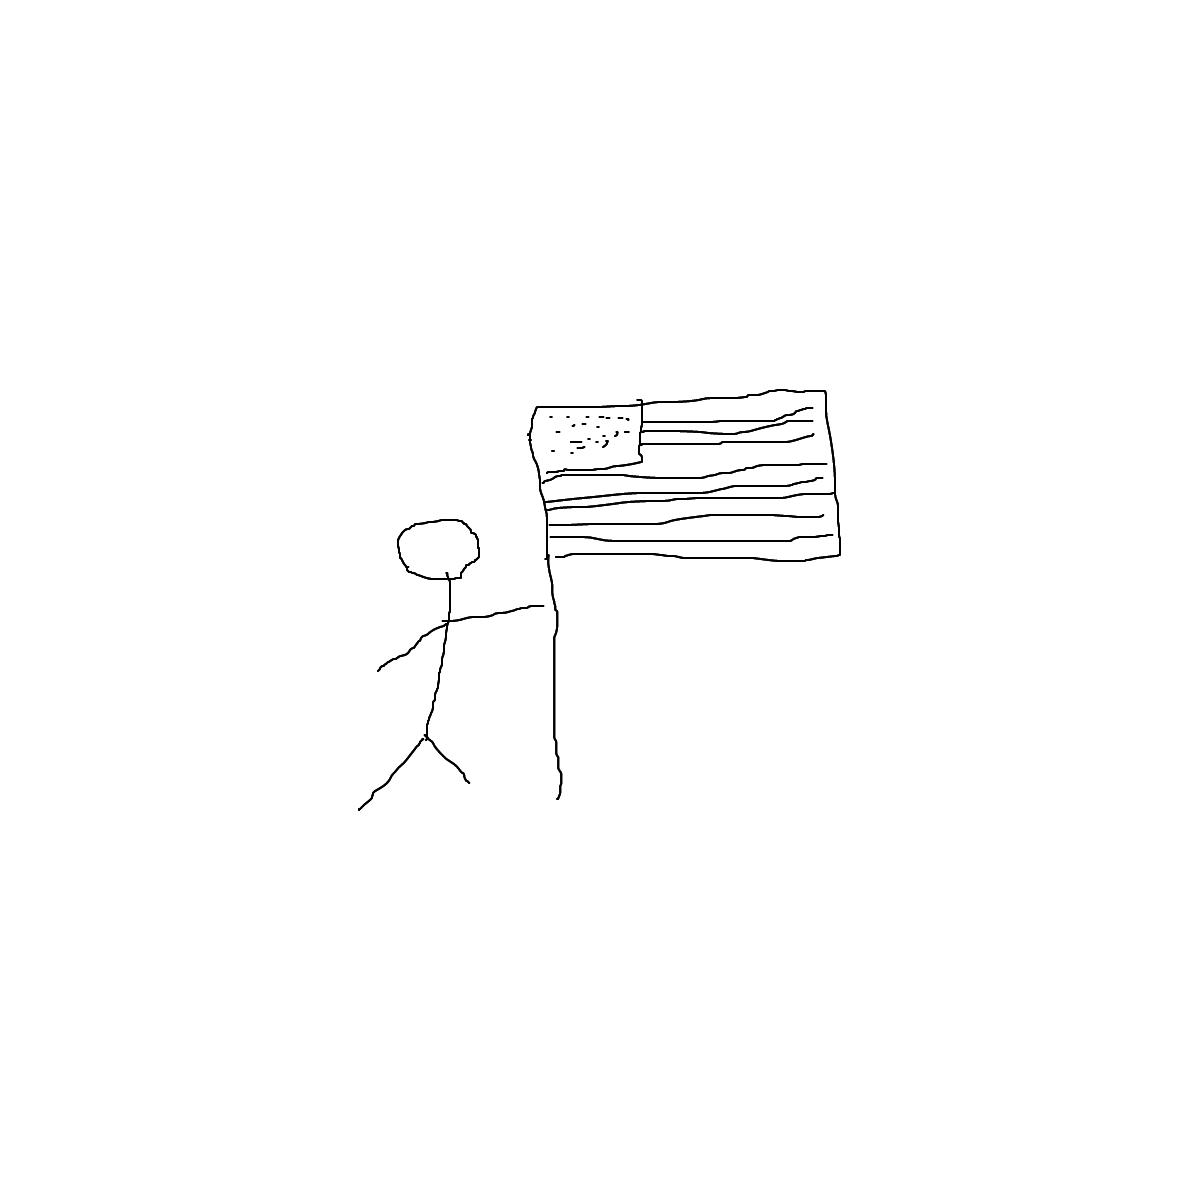 BAAAM drawing#12018 lat:35.7532424926757800lng: 139.8381042480468800